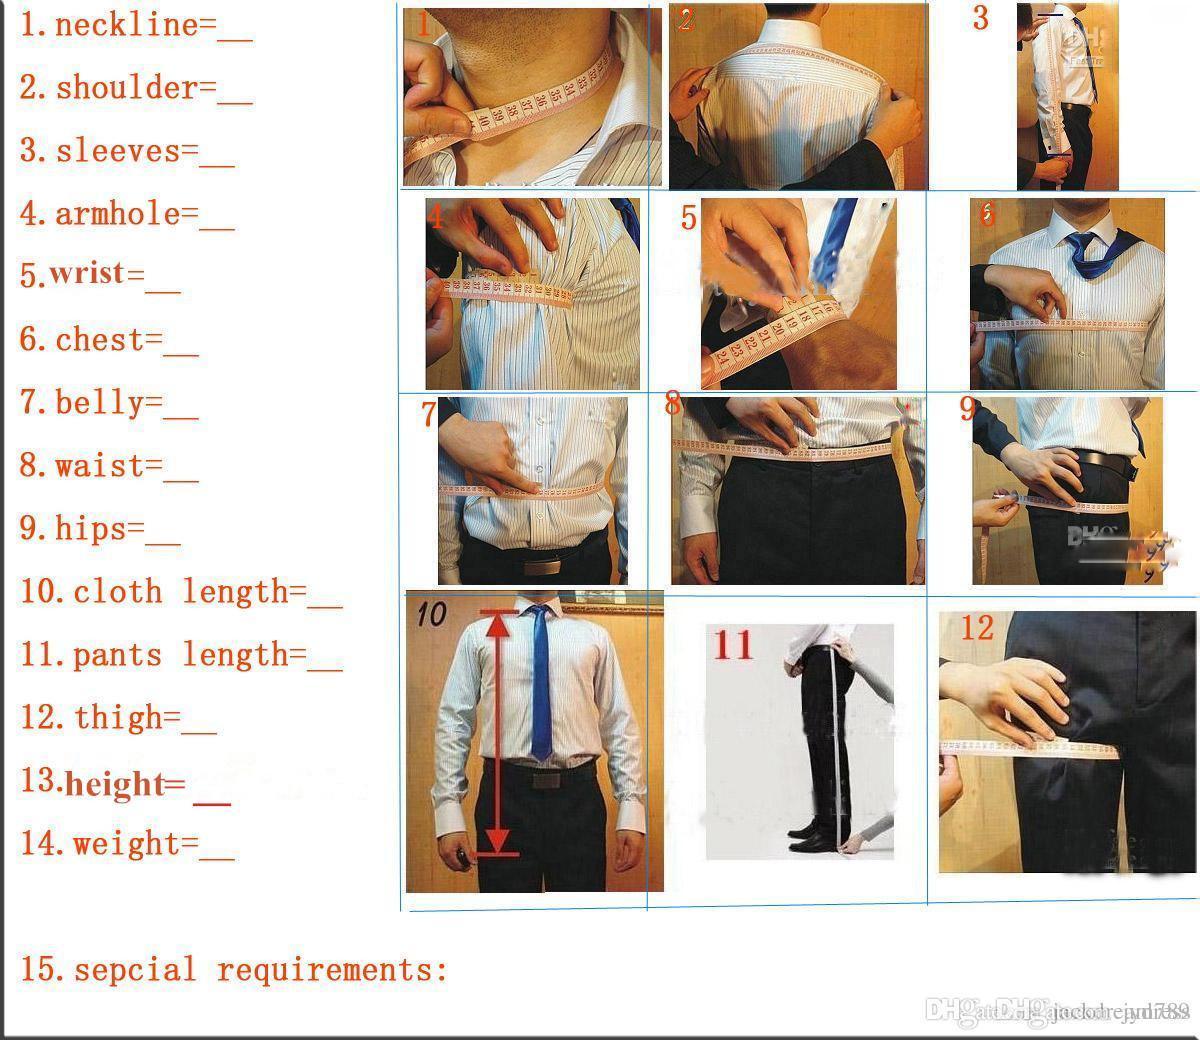 New Royal Blue Jacket Tuxedo Black Shawl Velvet Lapel Best Men Suit Formal Party Prom Wedding Groom Suits Jacket+Pants YM